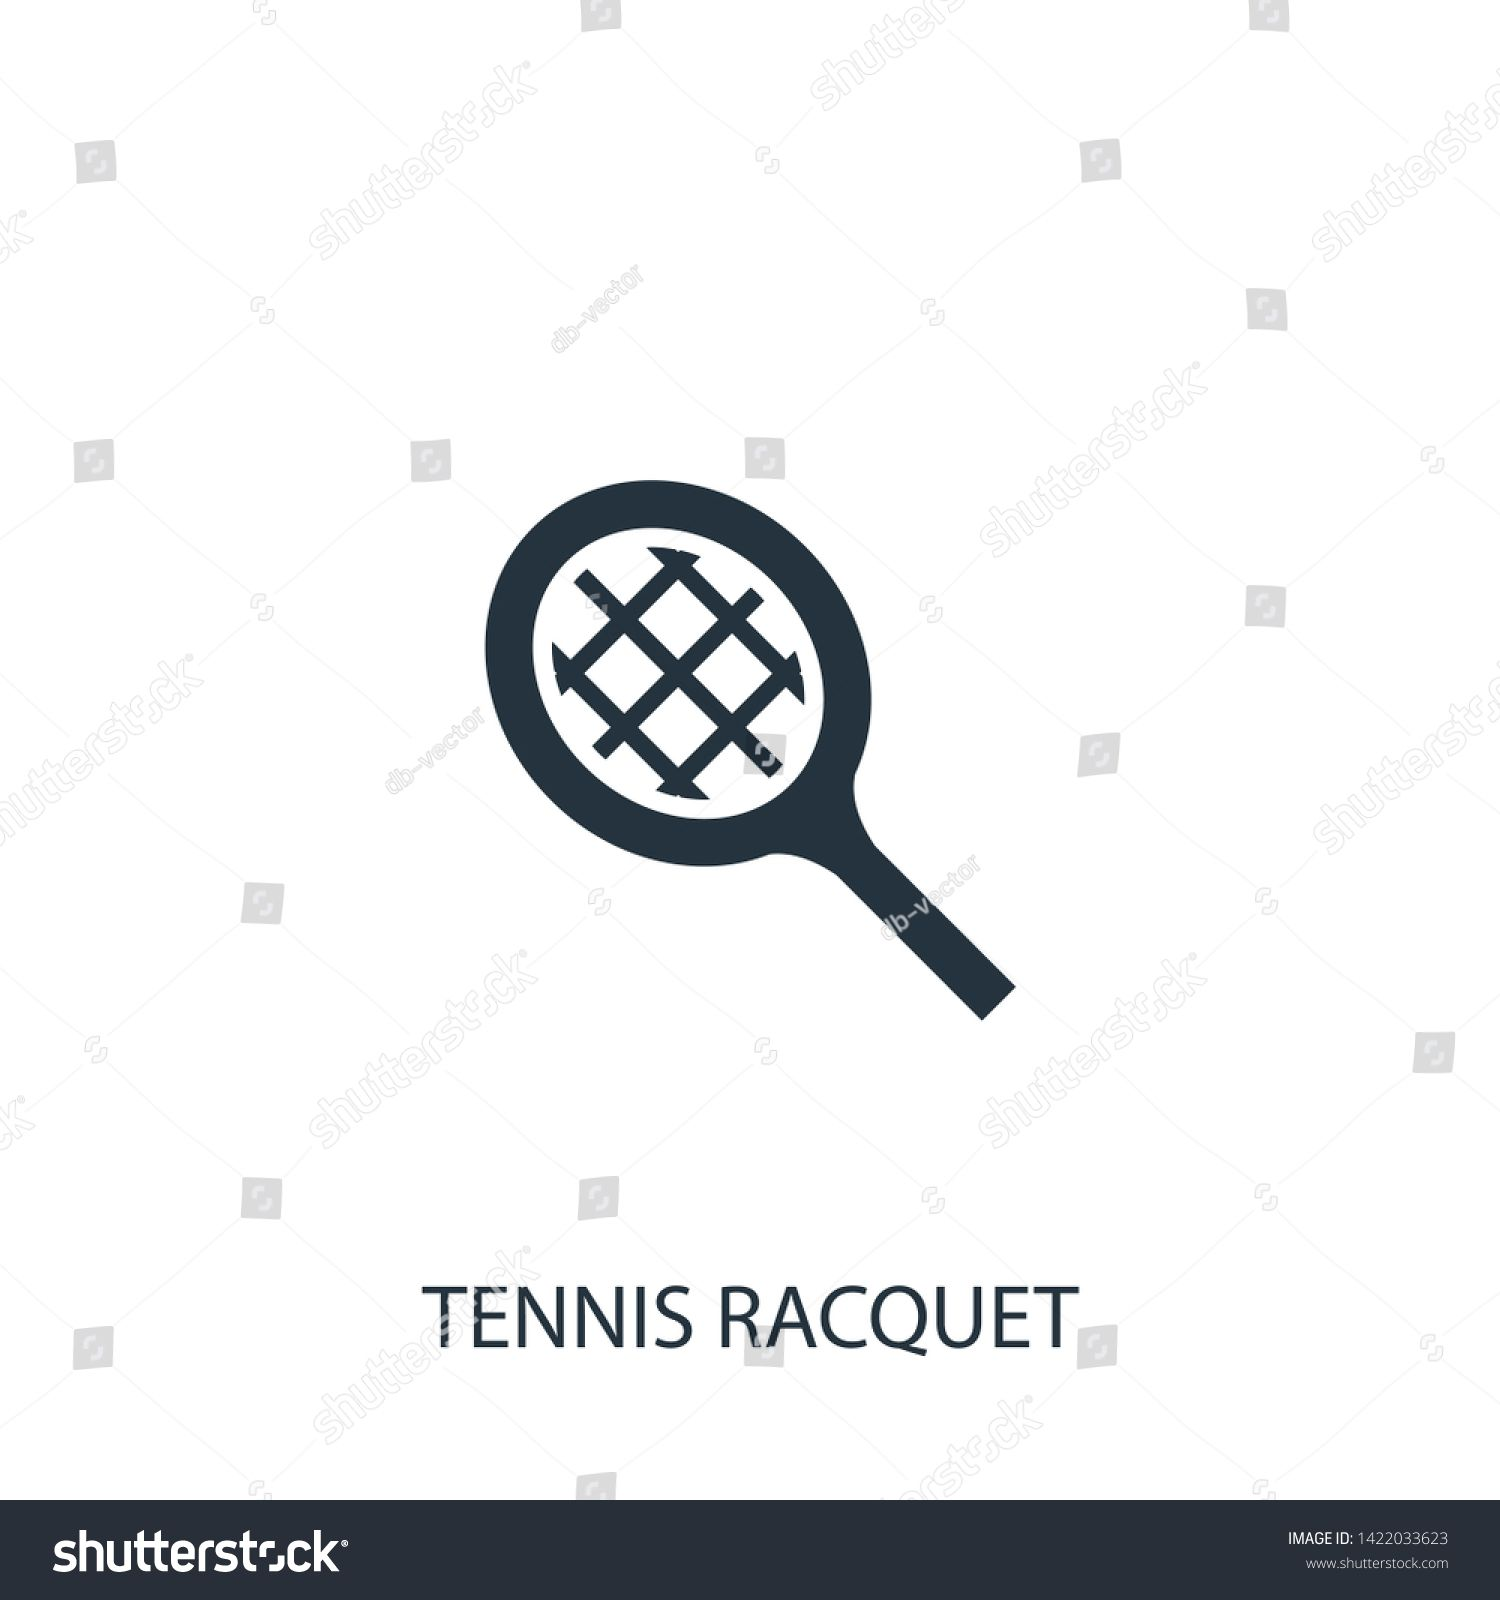 Tennis Racket Black Icon Concept Vector Sign On Isolated Background Tennis Racket Illustration Sym Social Media Design Graphics Oval Sunglass Website Design